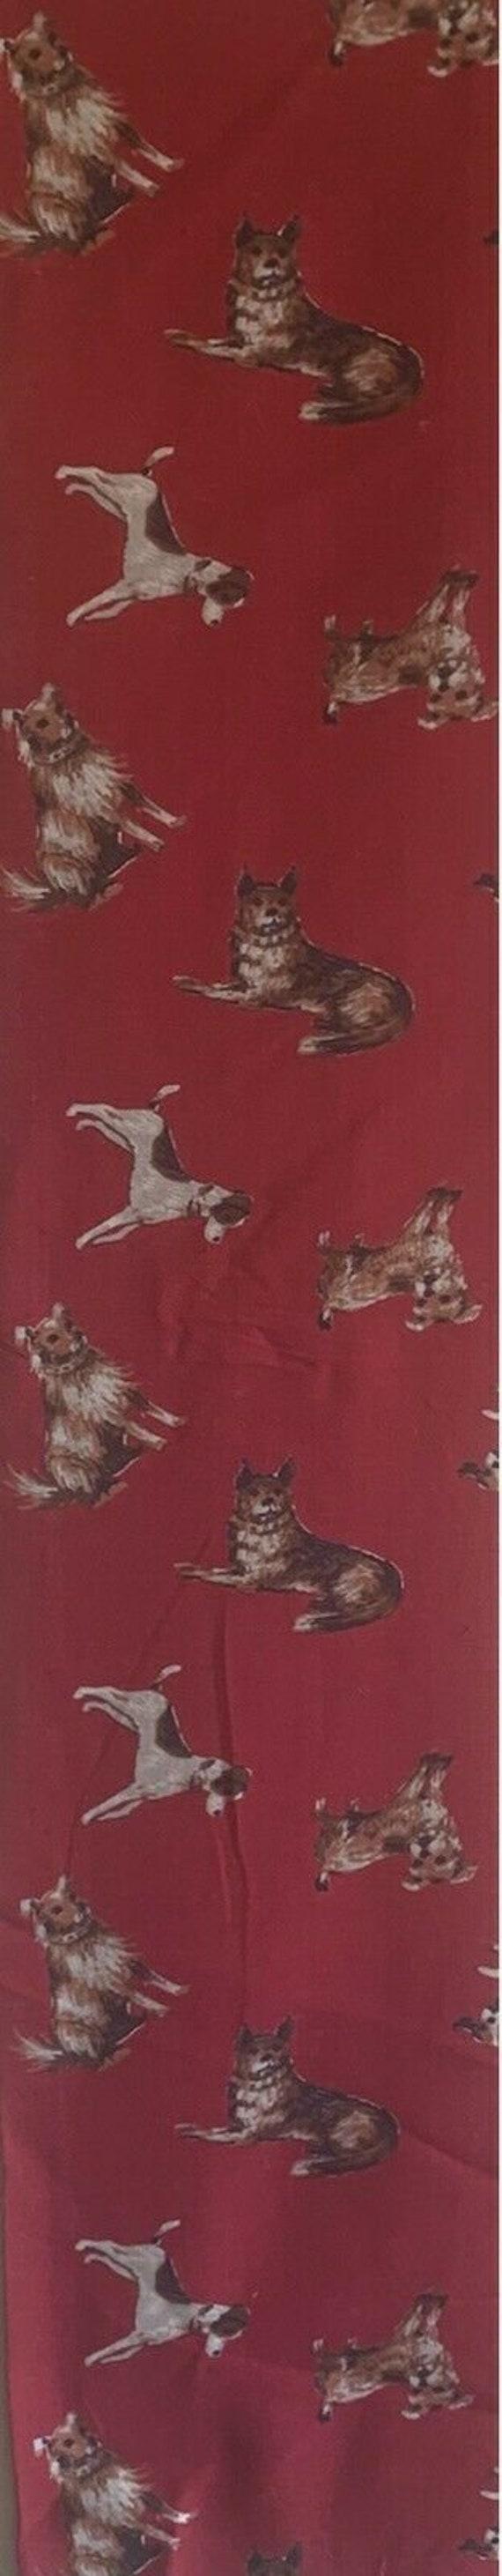 "Charming 20th Cent. American cotton ""dog"" print 5234"